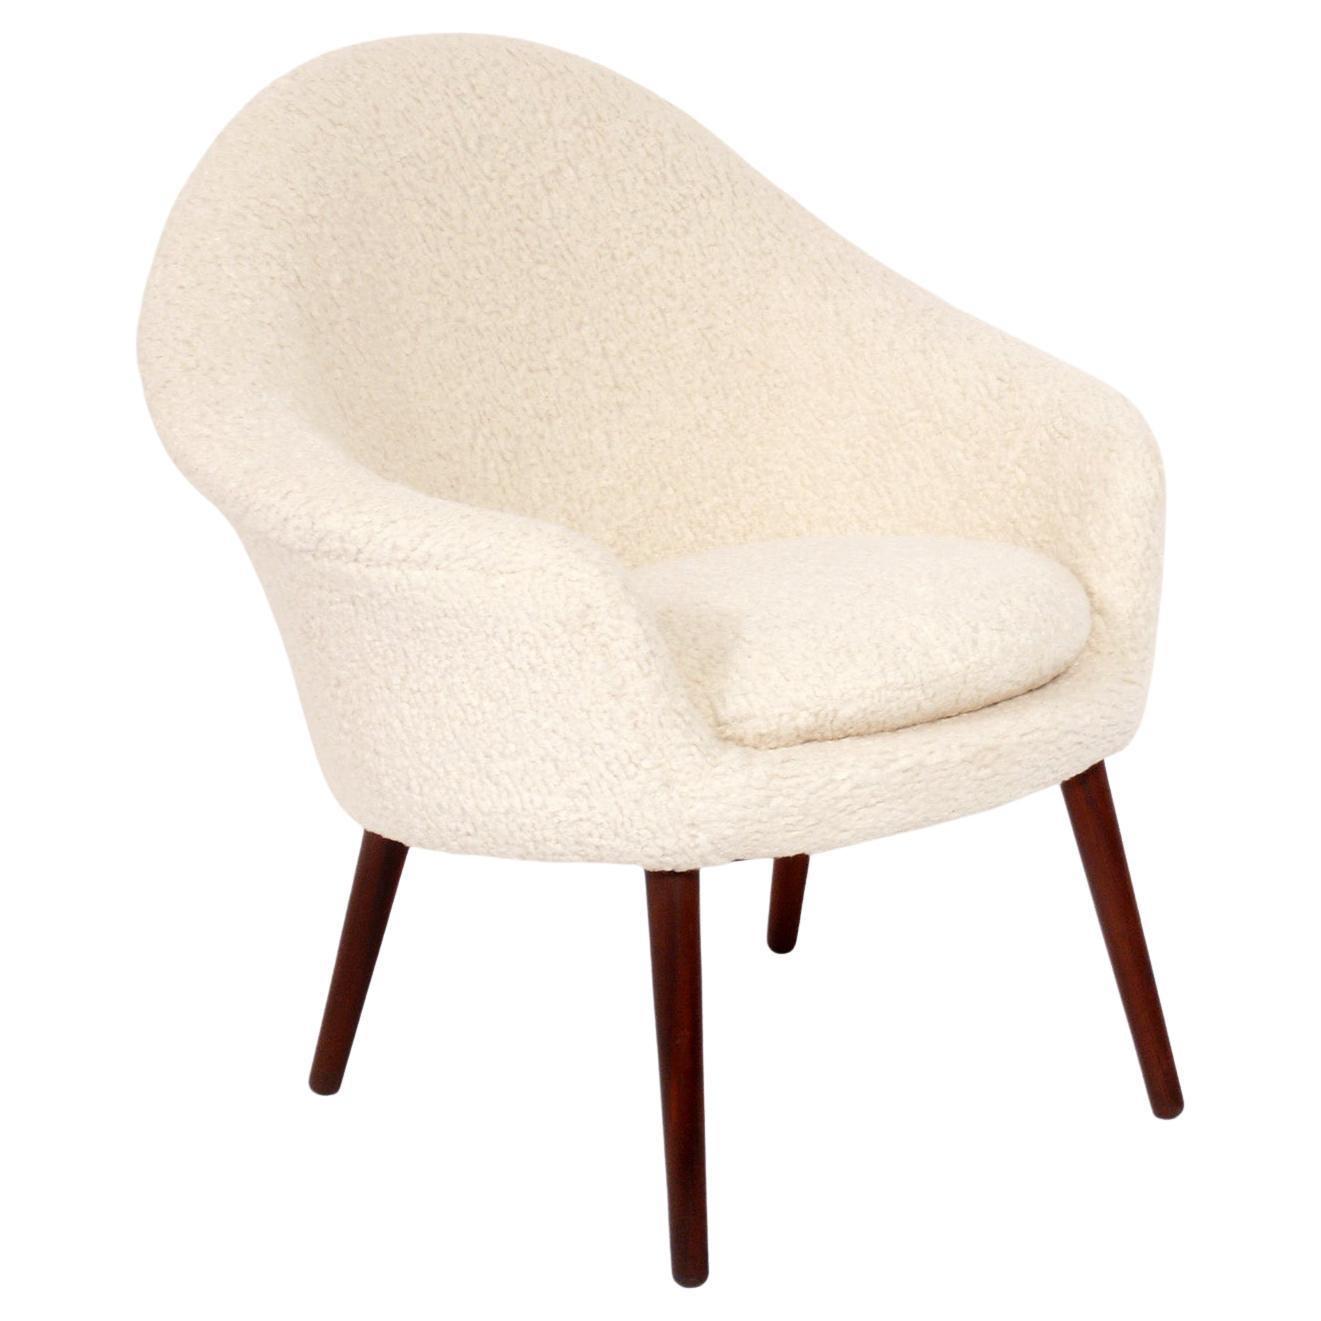 Danish Modern Lounge Chair by iHans Olsen n Faux Sheepskin